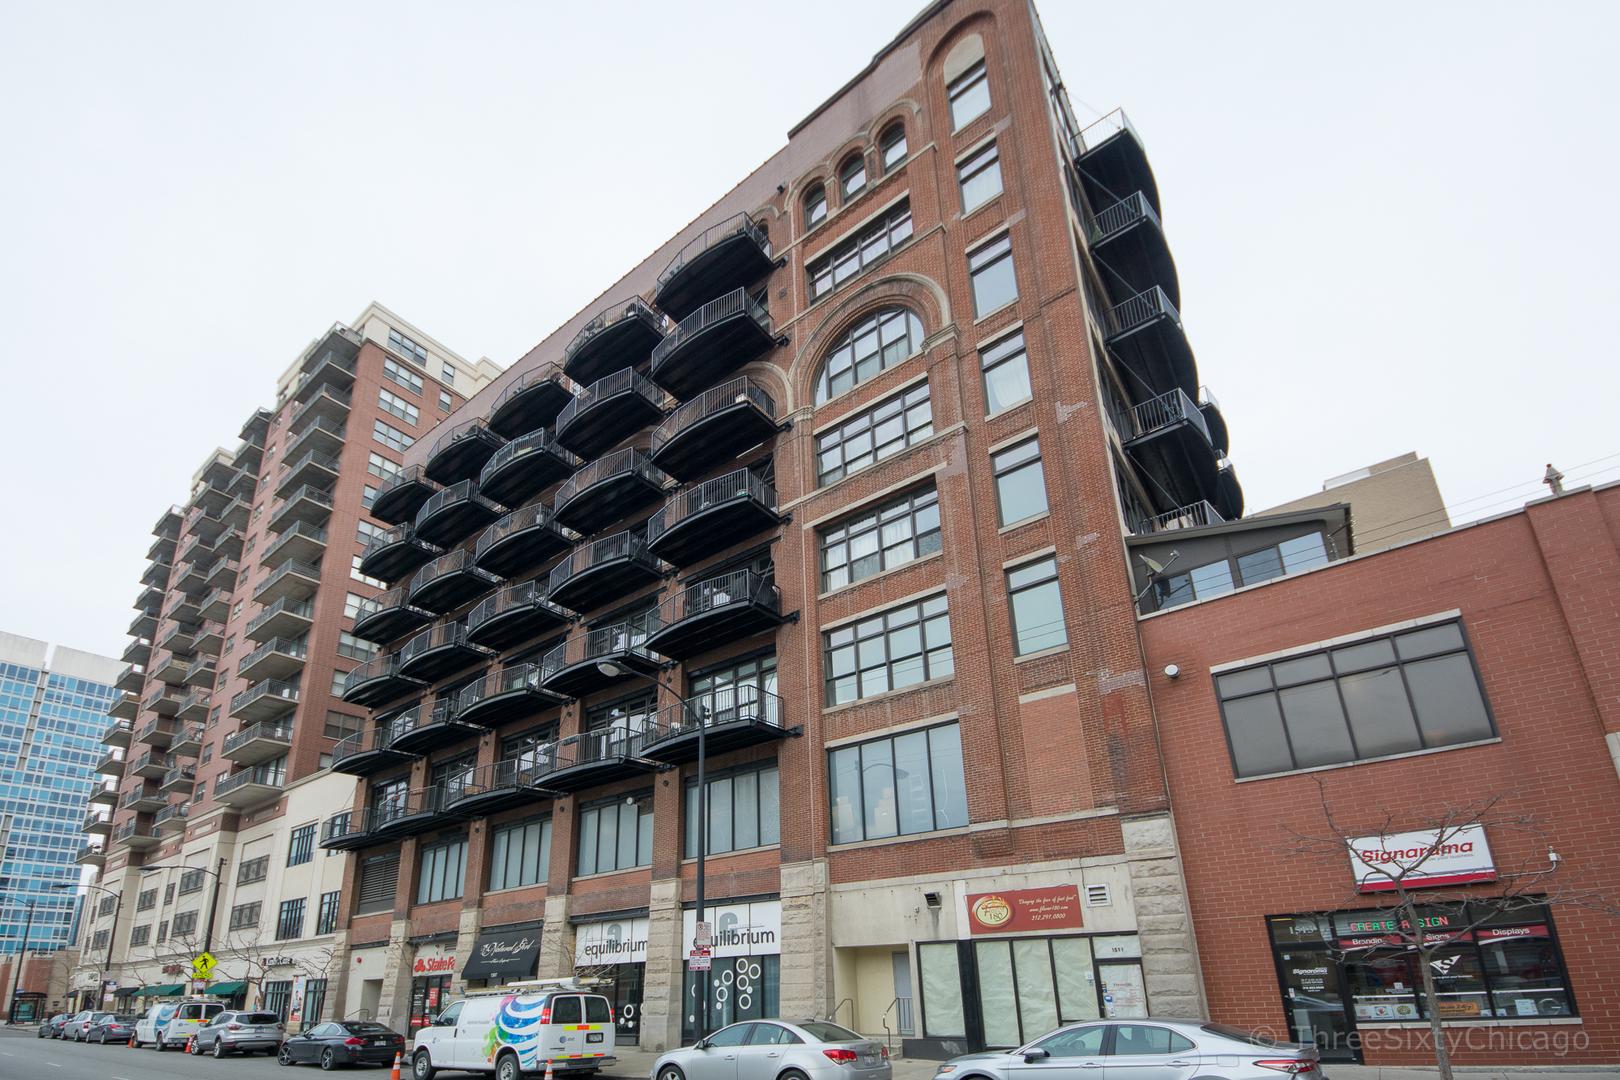 1503 State Unit Unit 610 ,Chicago, Illinois 60605